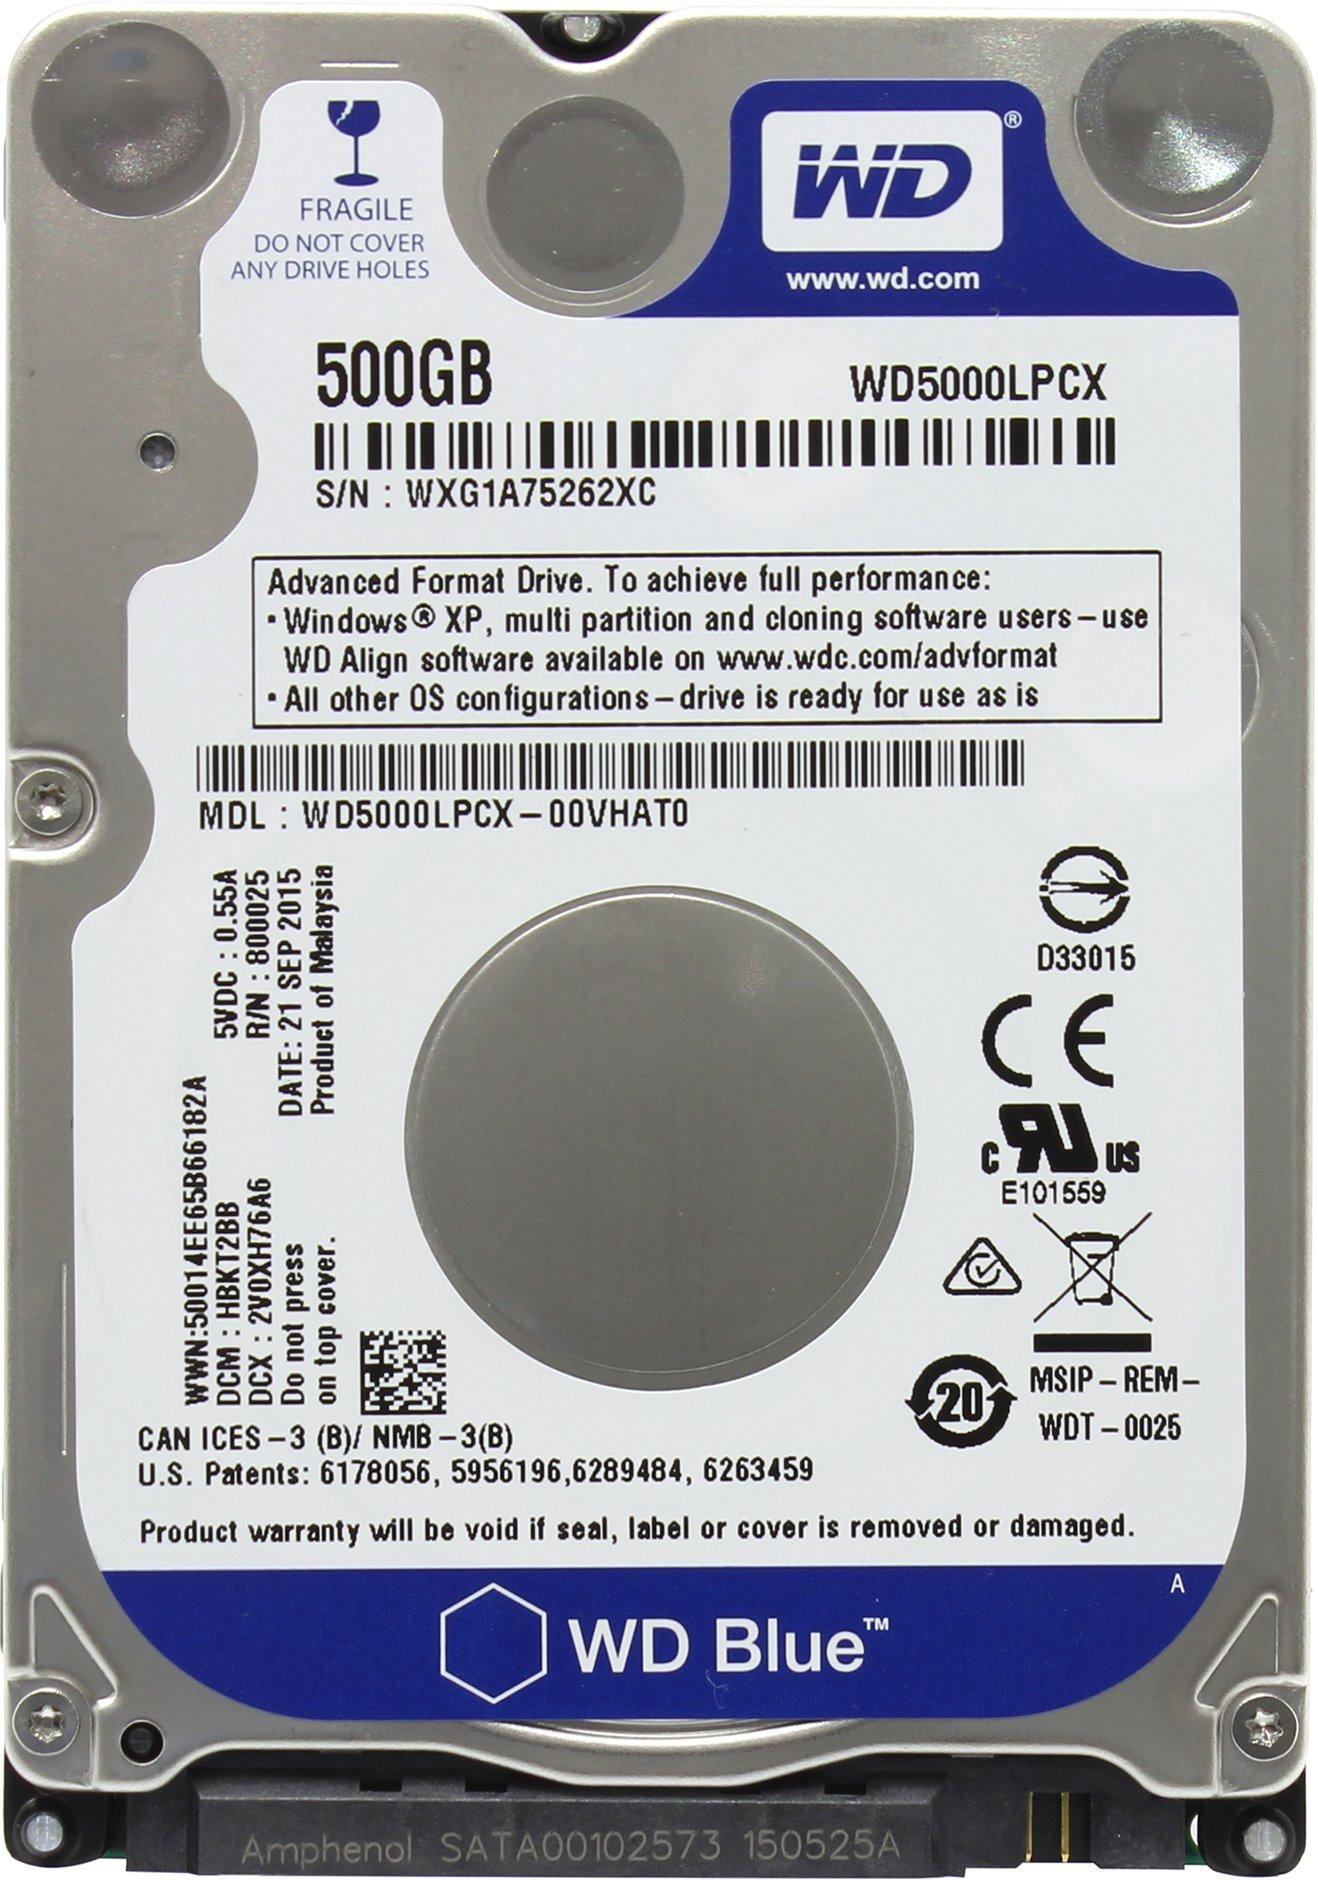 Western Digital 500GB 2.5'' Playstation 3/Playstation 4 Hard Drive (PS3 Fat, PS3 Slim, PS3 Super Slim, PS4) by Western Digital